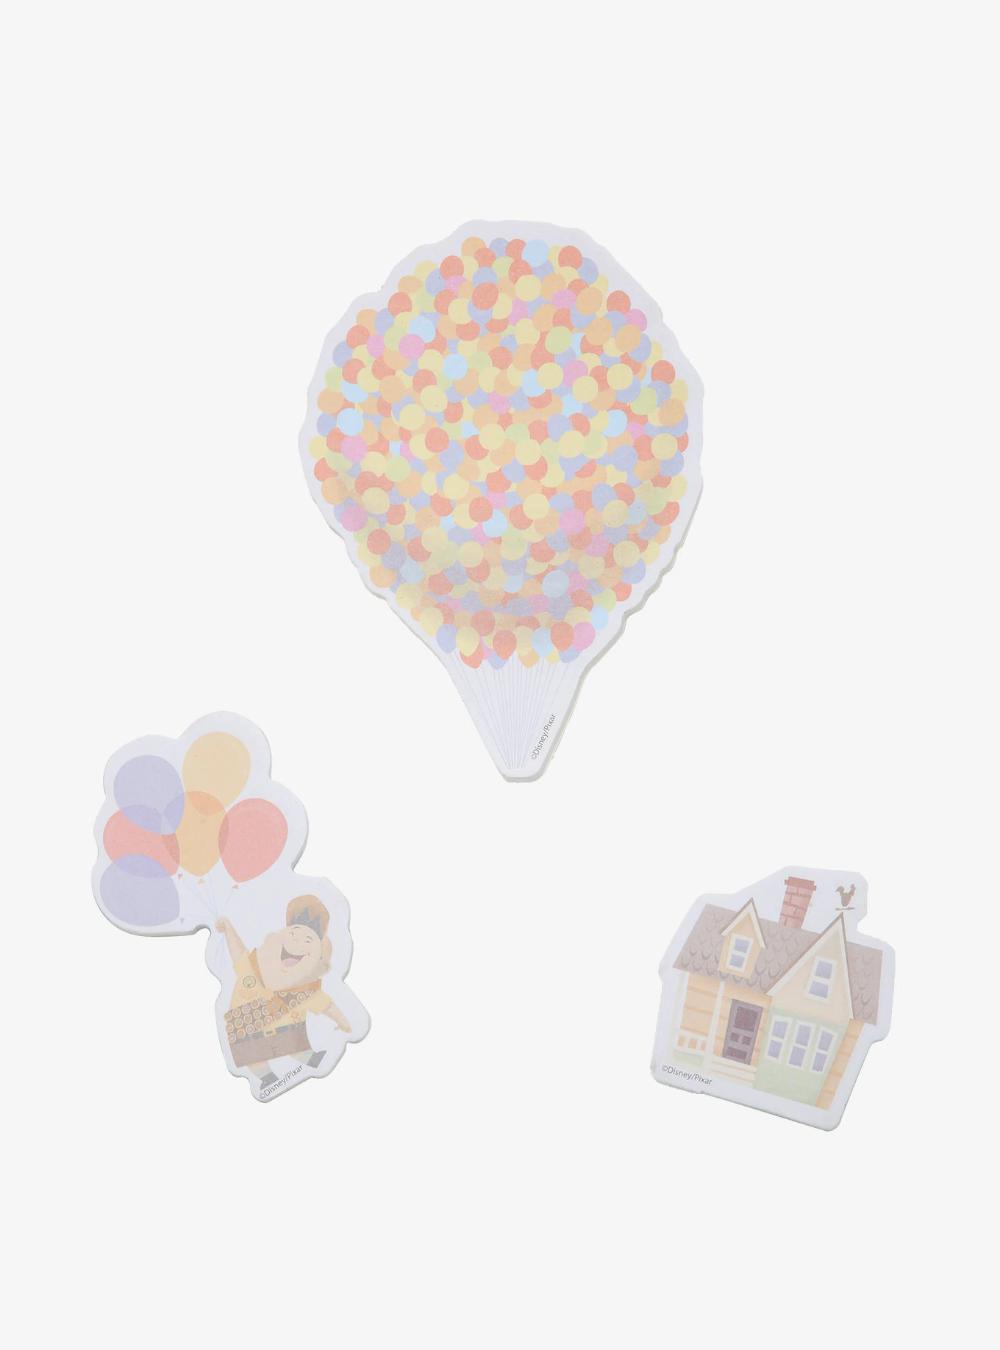 Disney Pixar Up Balloon House Sticky Note Set Disney Pixar Up Balloon House Up Balloons